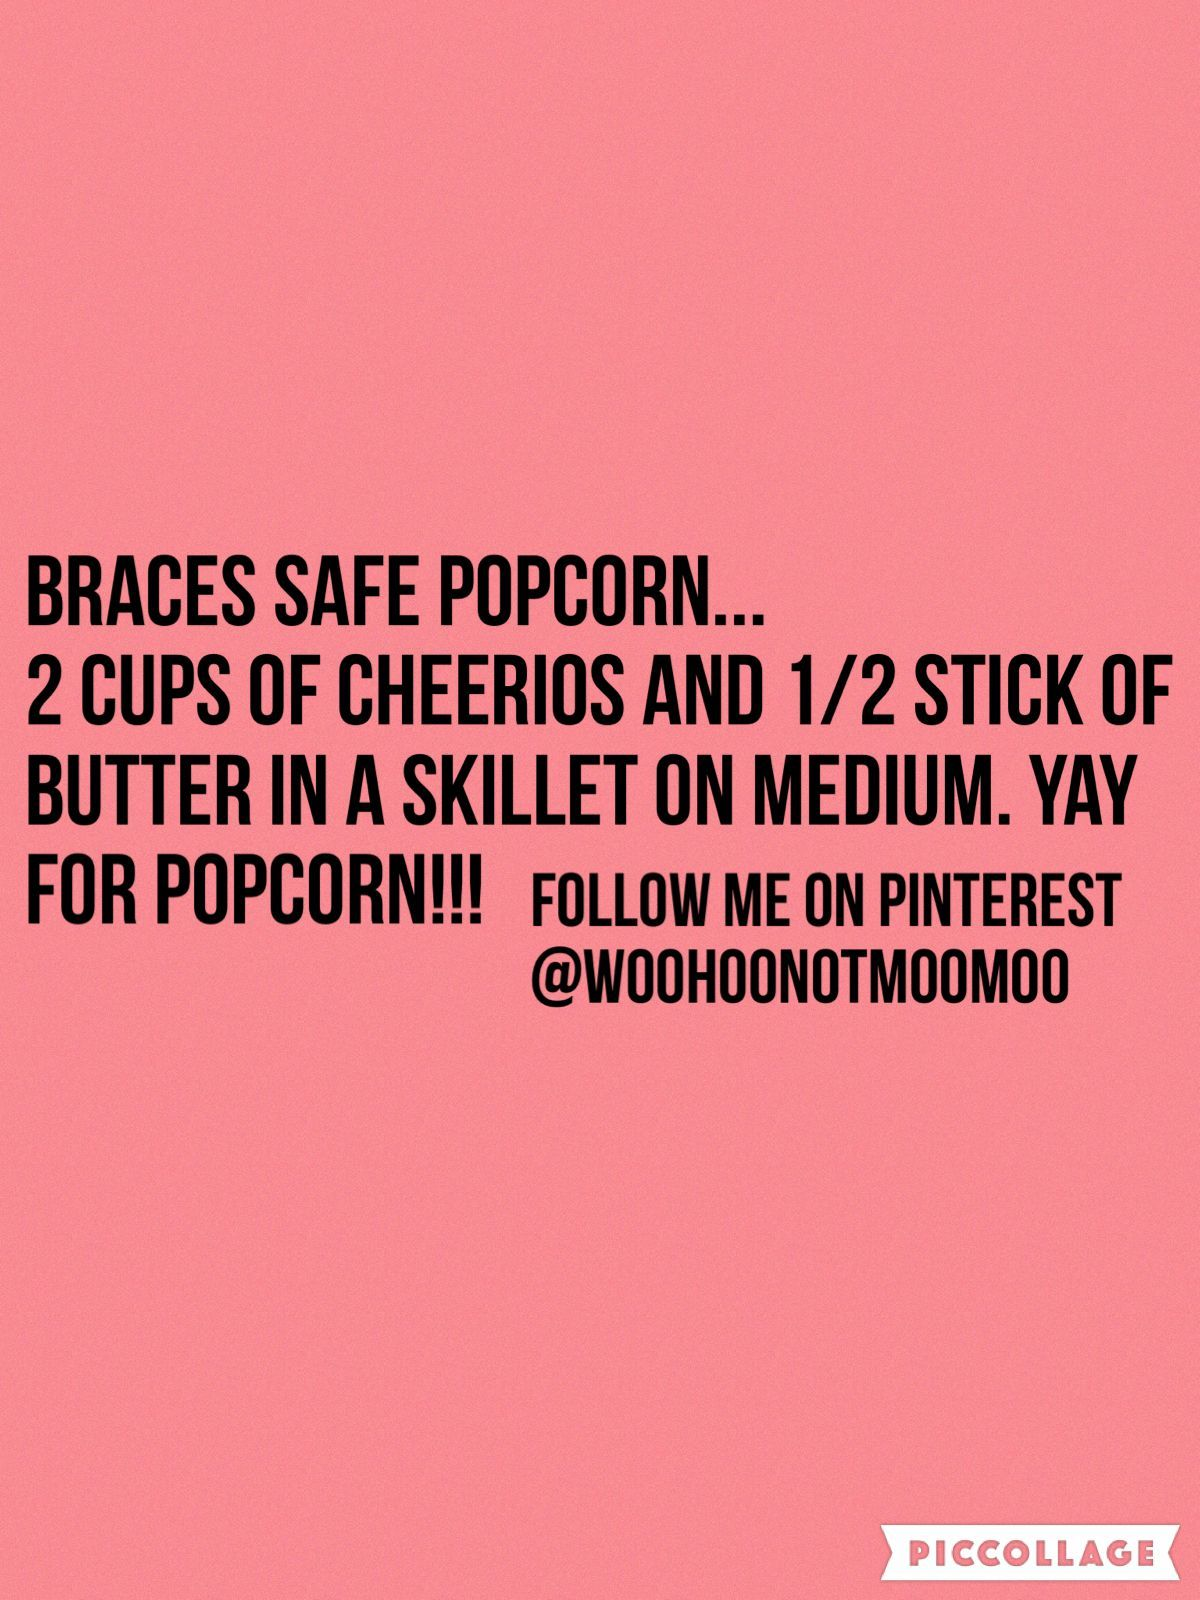 Braces food braces food braces tips braces food